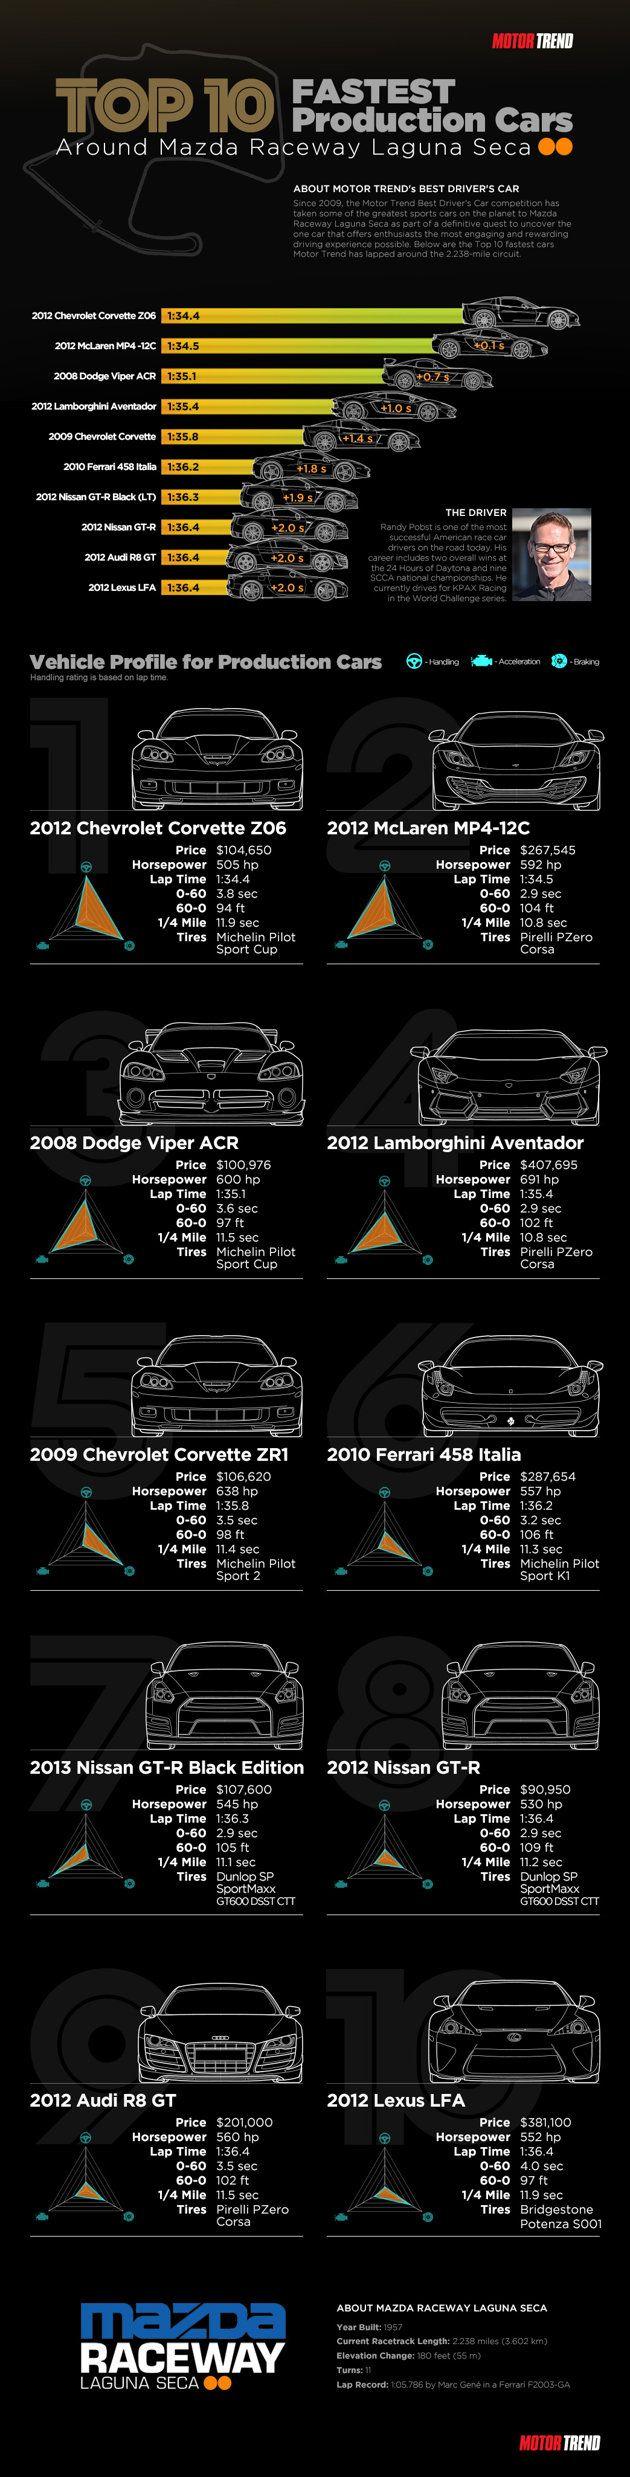 Top 10 fastest production cars Motor Trend has lapped around Laguna Seca